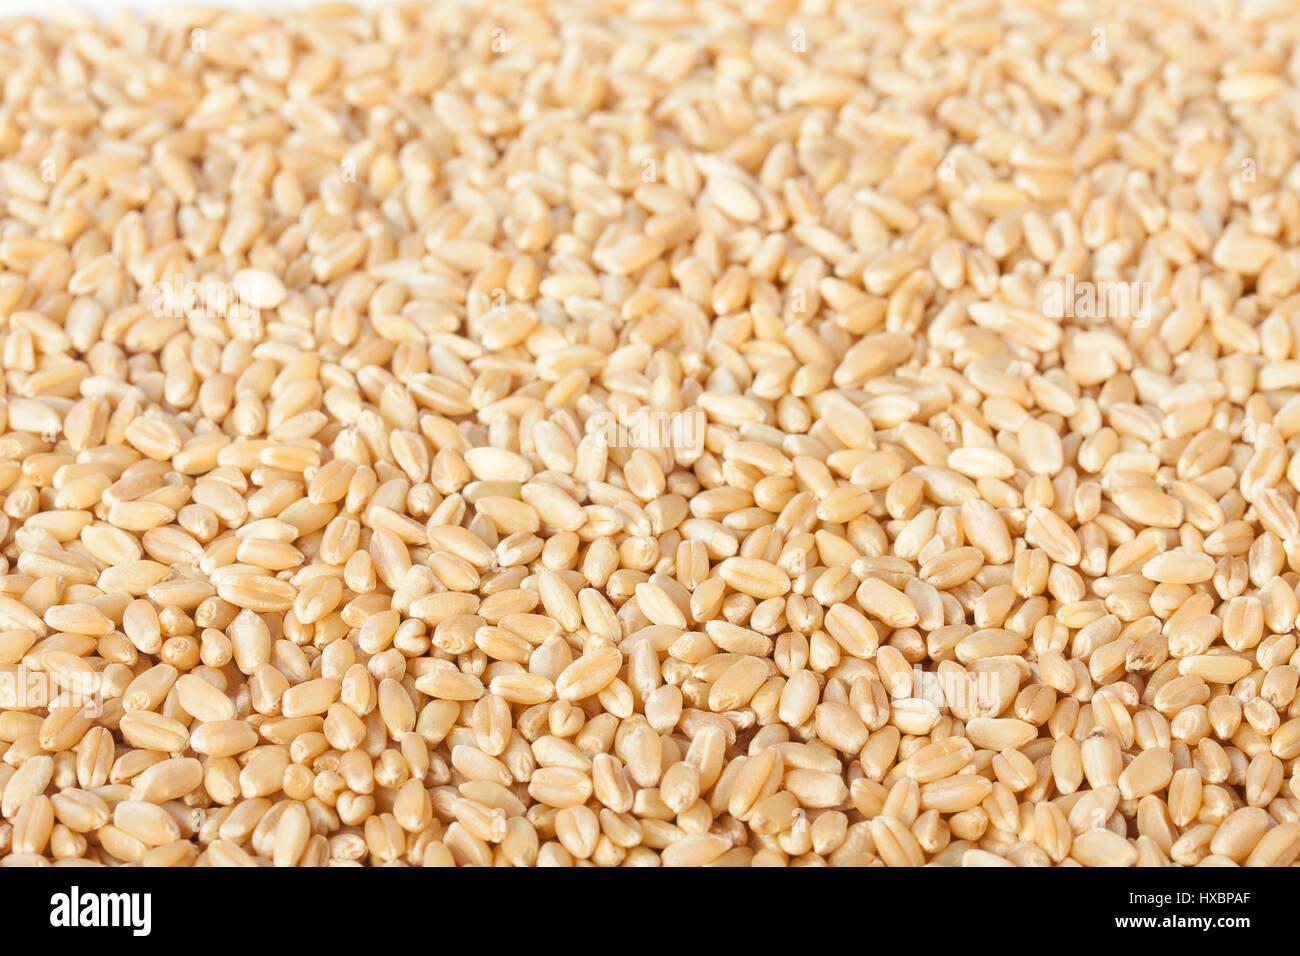 Wheat grain close up - Stock Image